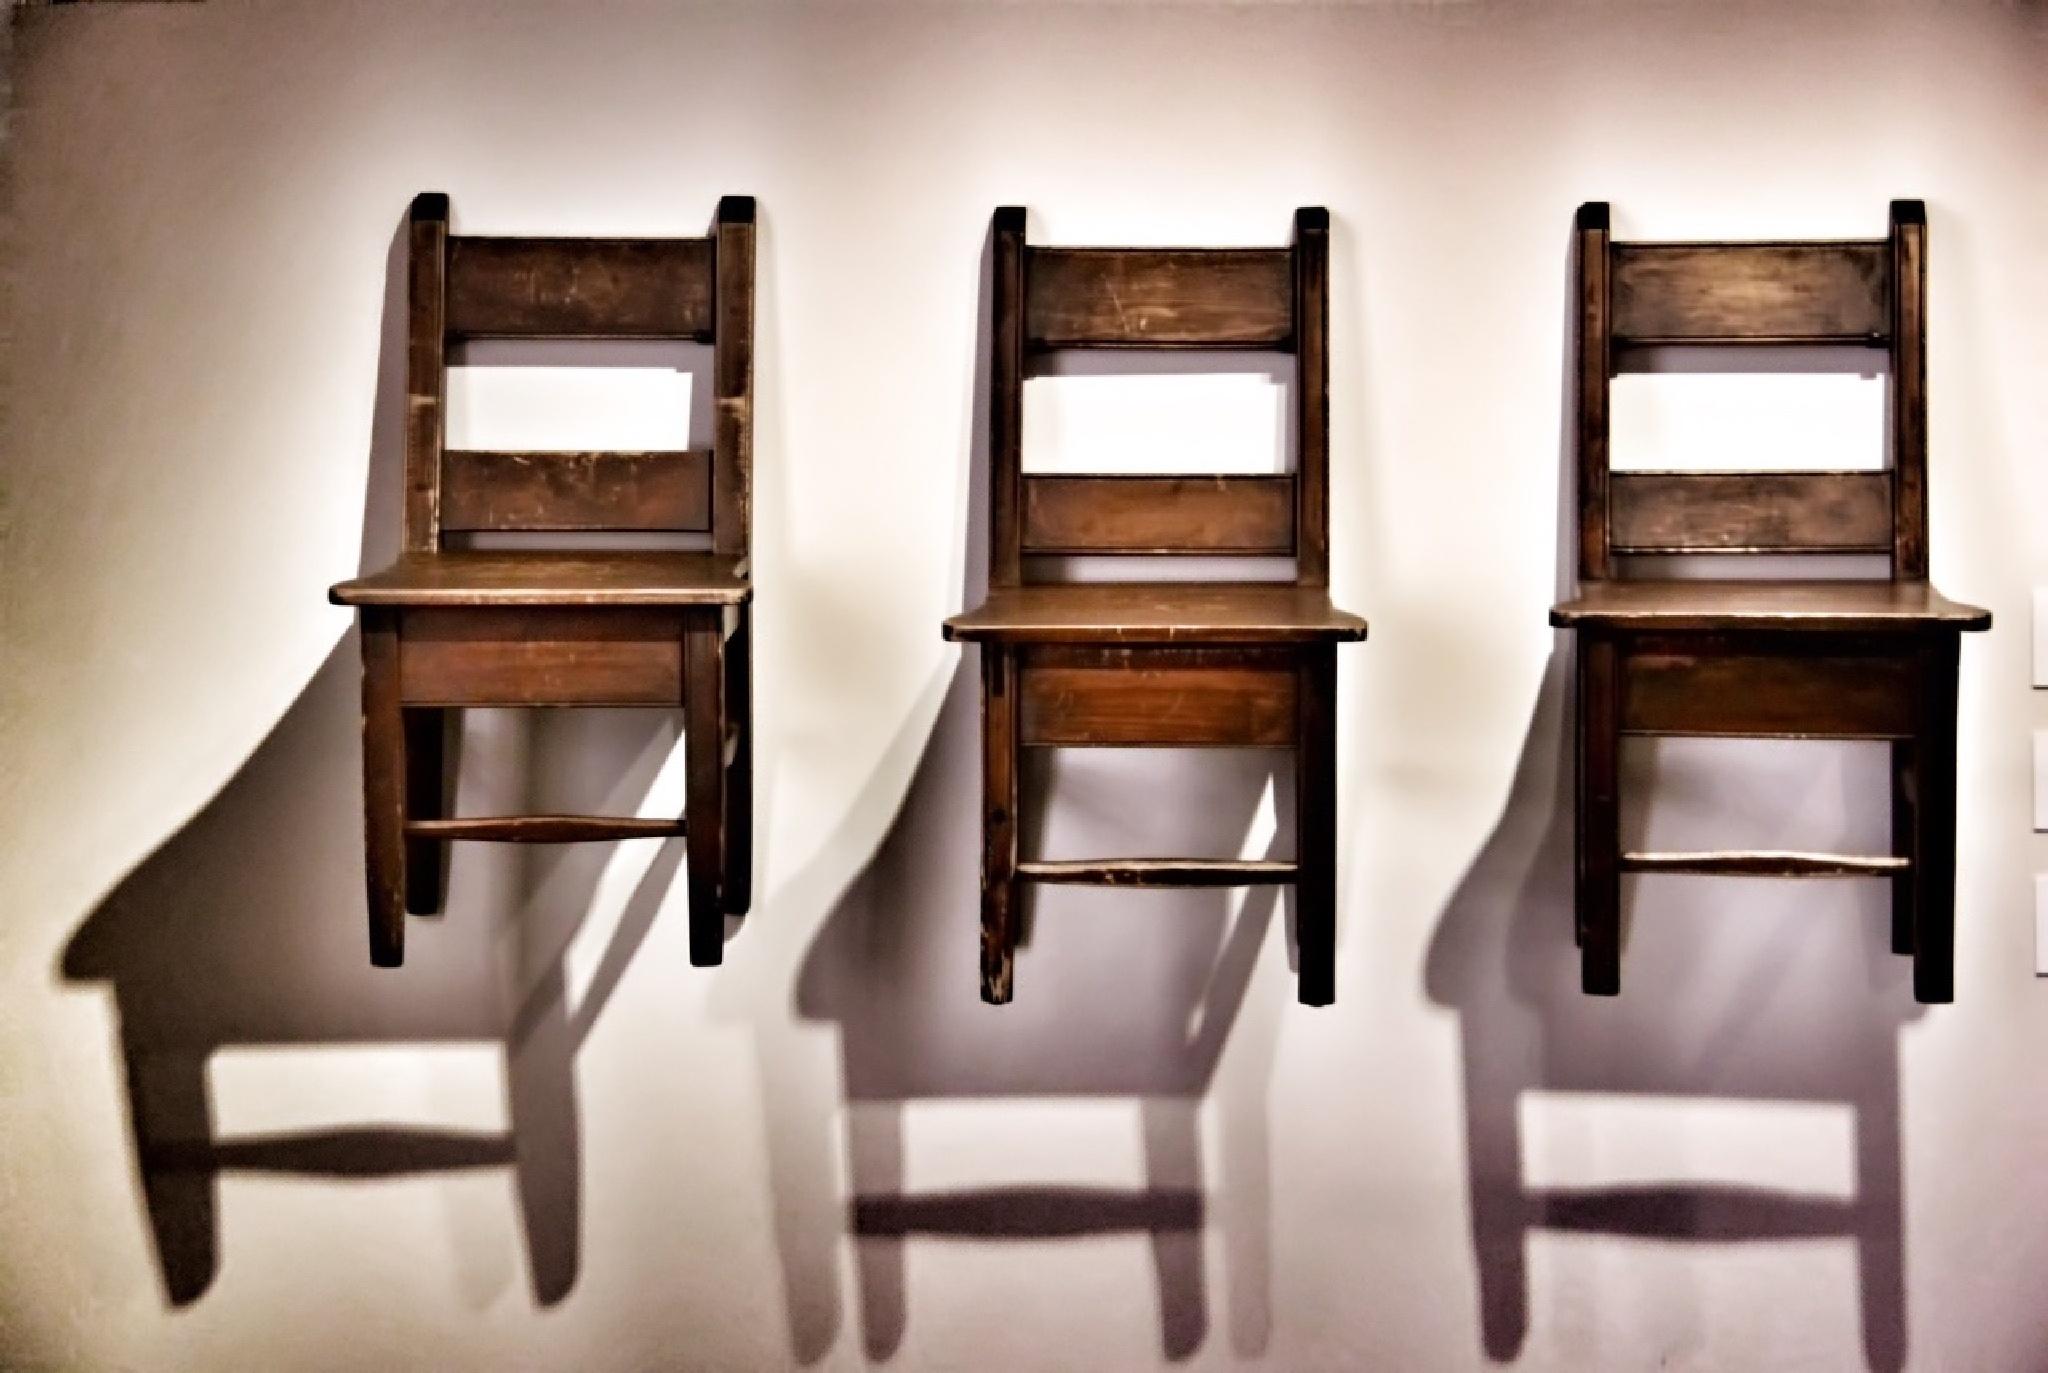 THREE CHAIRS by jody frankel